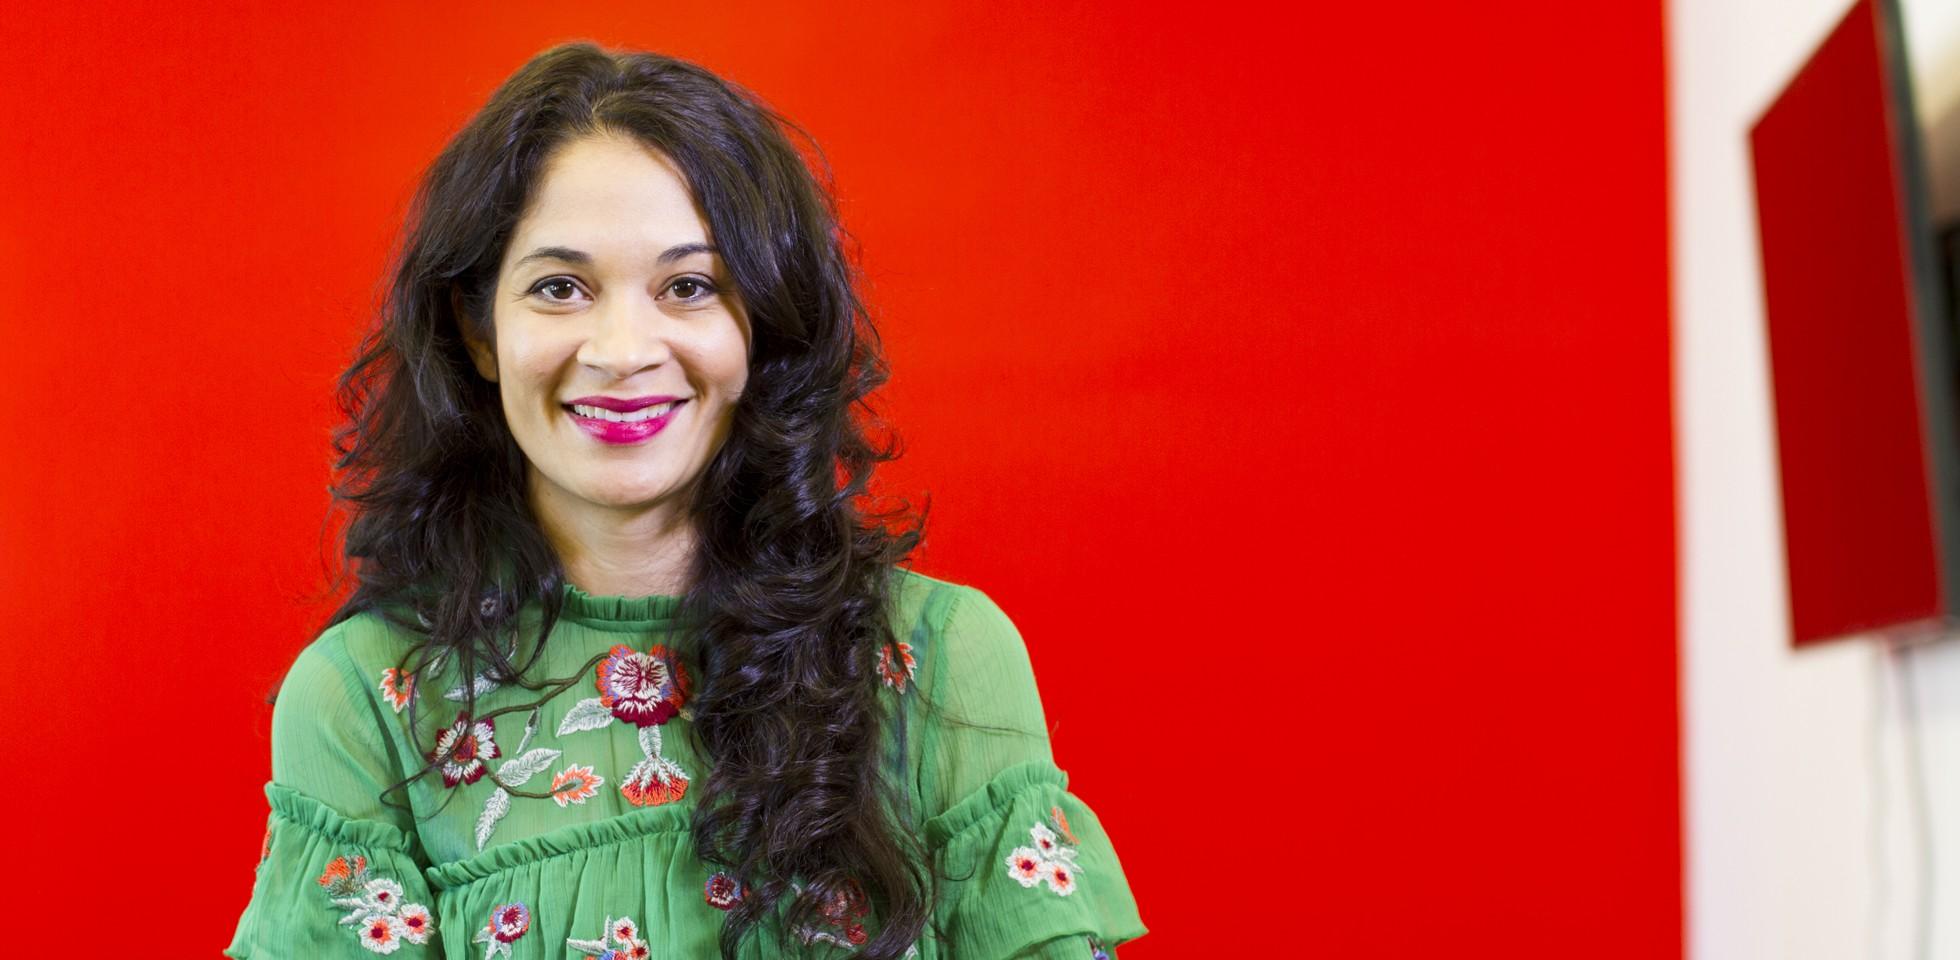 Micaéla Birmingham, Executive Producer - Some Spider Studios Careers